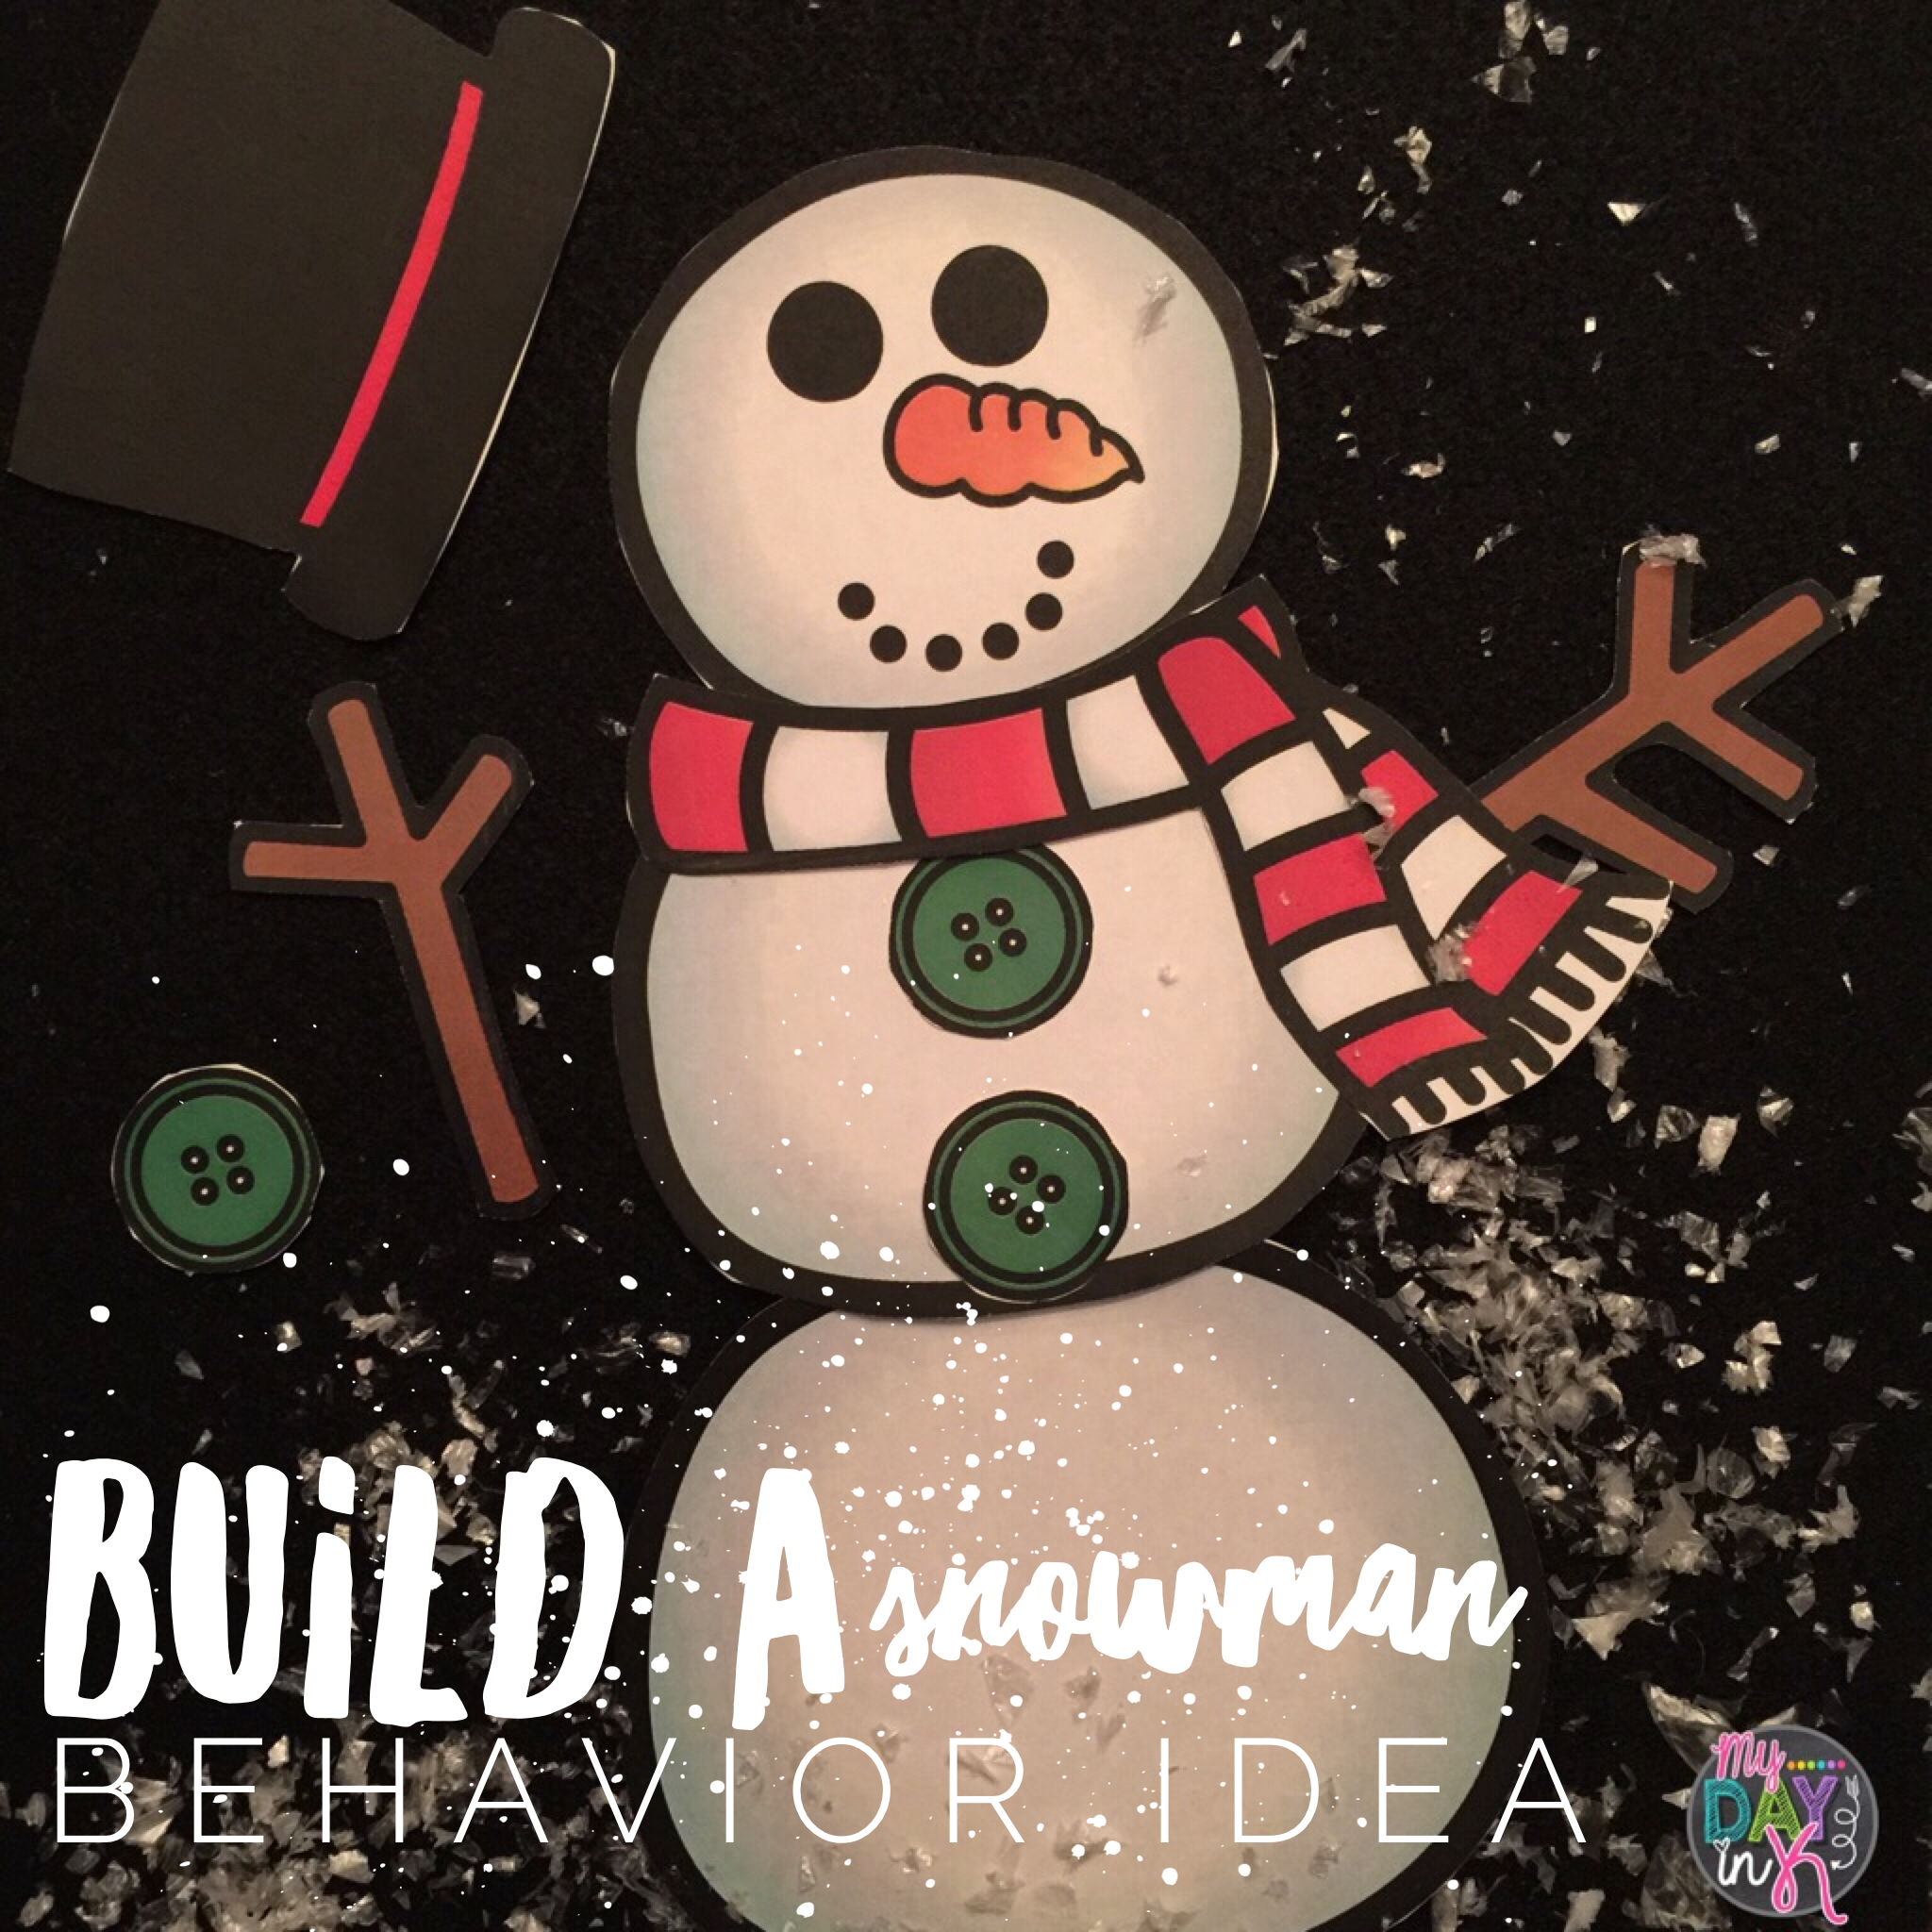 Build A Snowman Is A Fun Behavior Idea To Spotlight